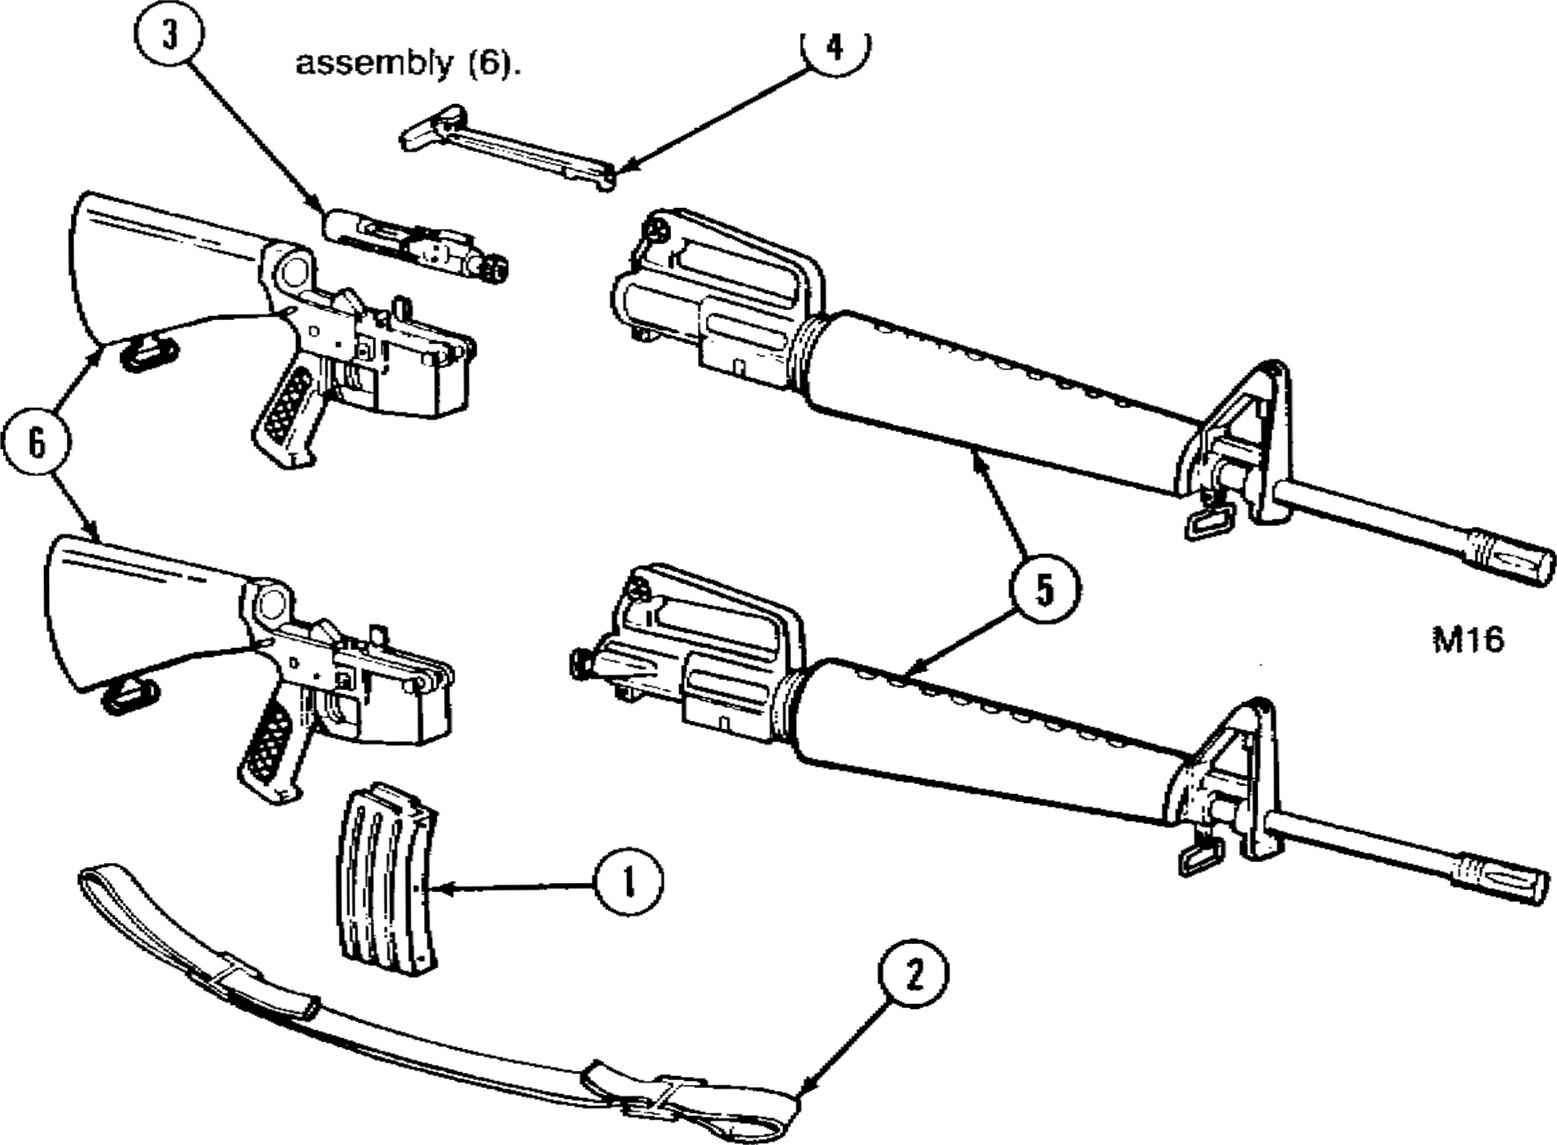 M 16 Quot Rifle Schematic